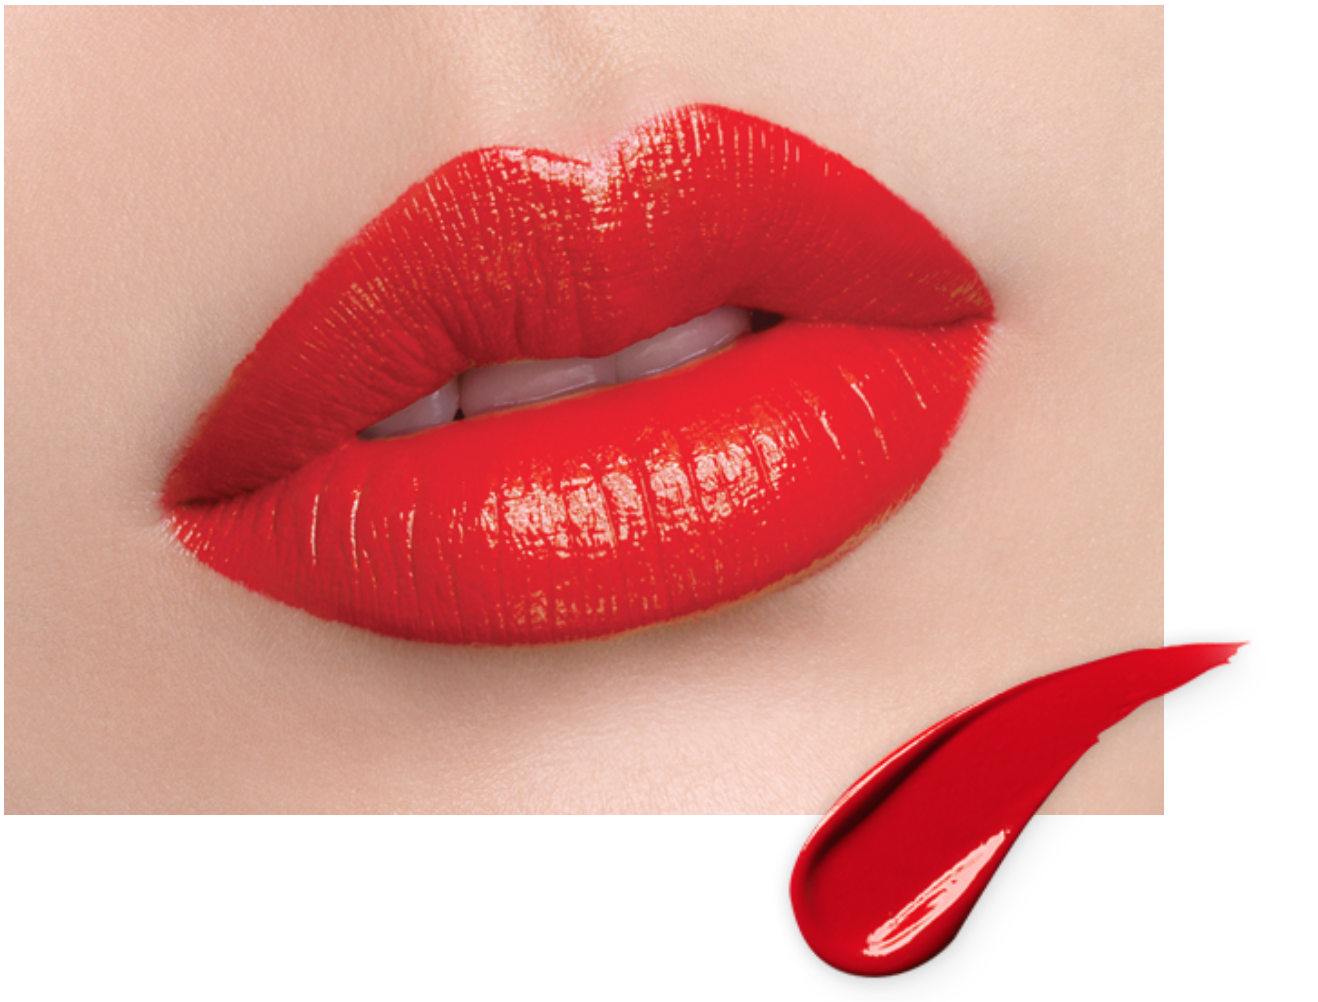 laneige-silk-intense-lipstick-315.png